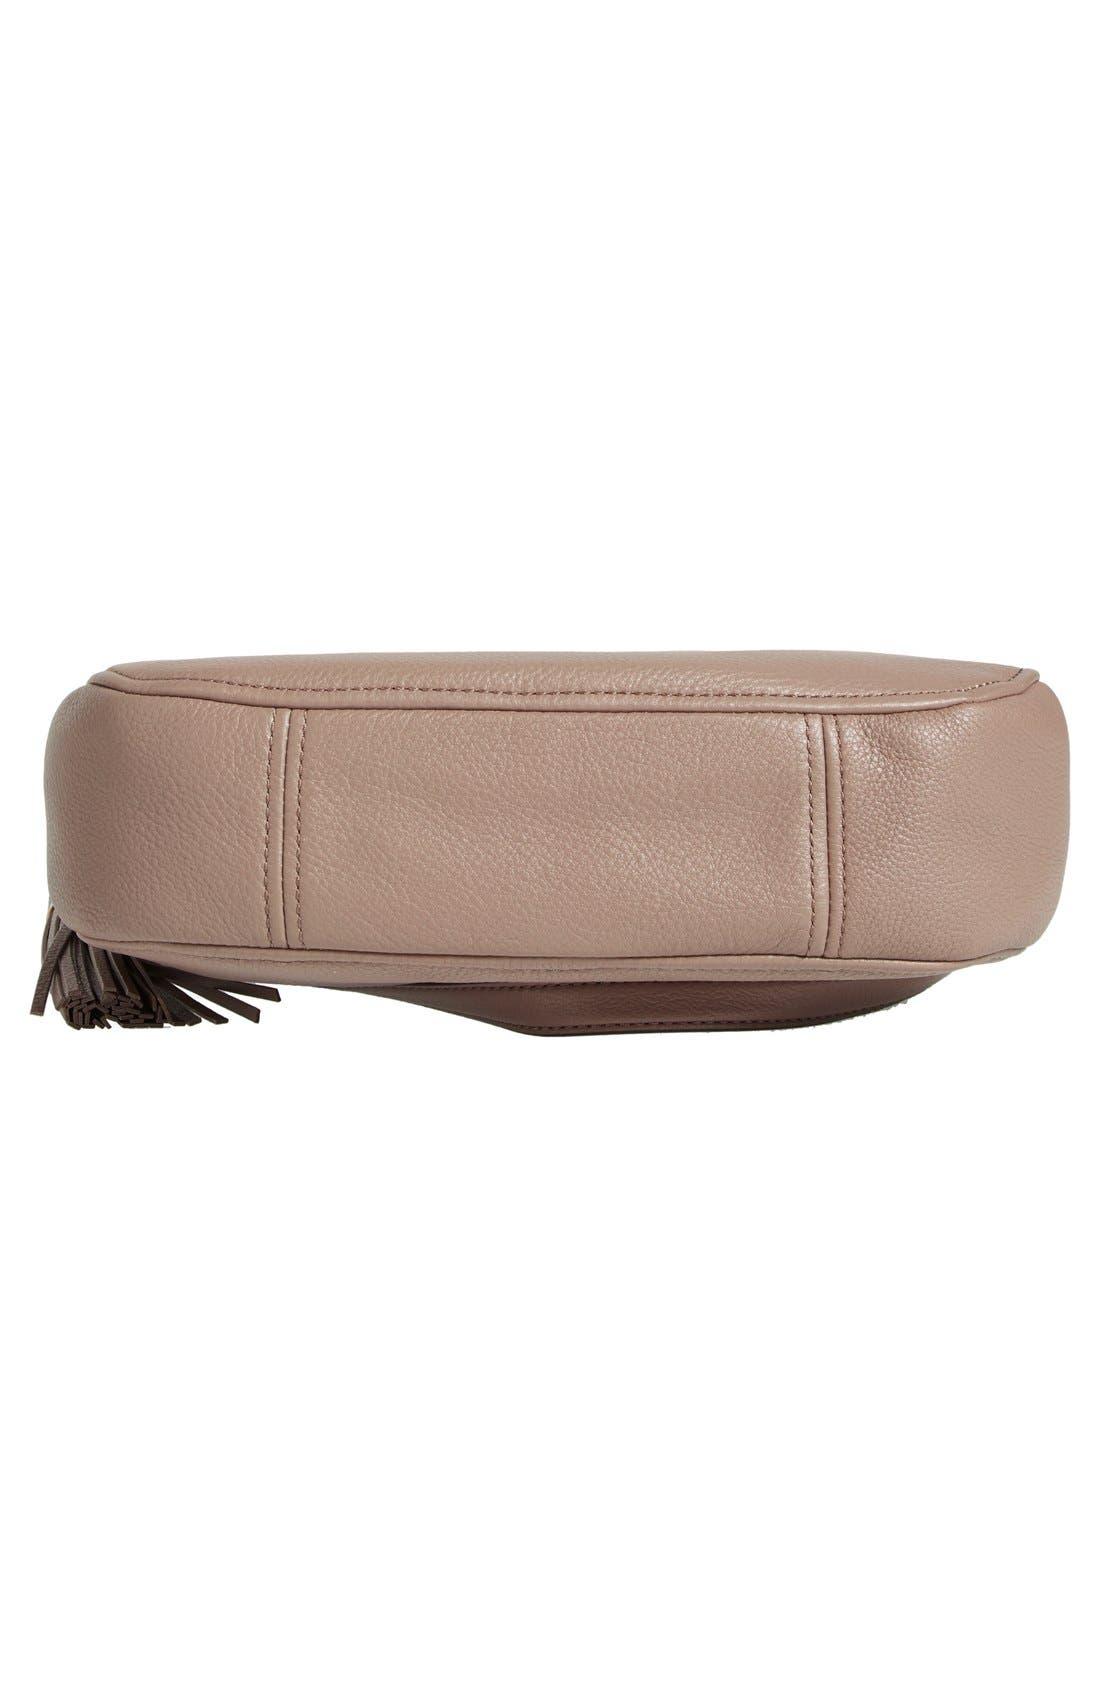 ,                             'Bedford Tassel - Medium' Convertible Leather Shoulder Bag,                             Alternate thumbnail 17, color,                             250